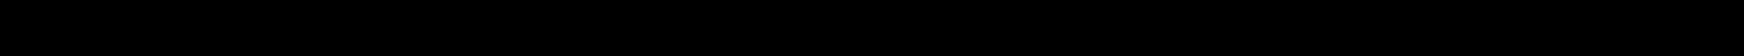 Neutra2TextGreek-DemiItalic.otf